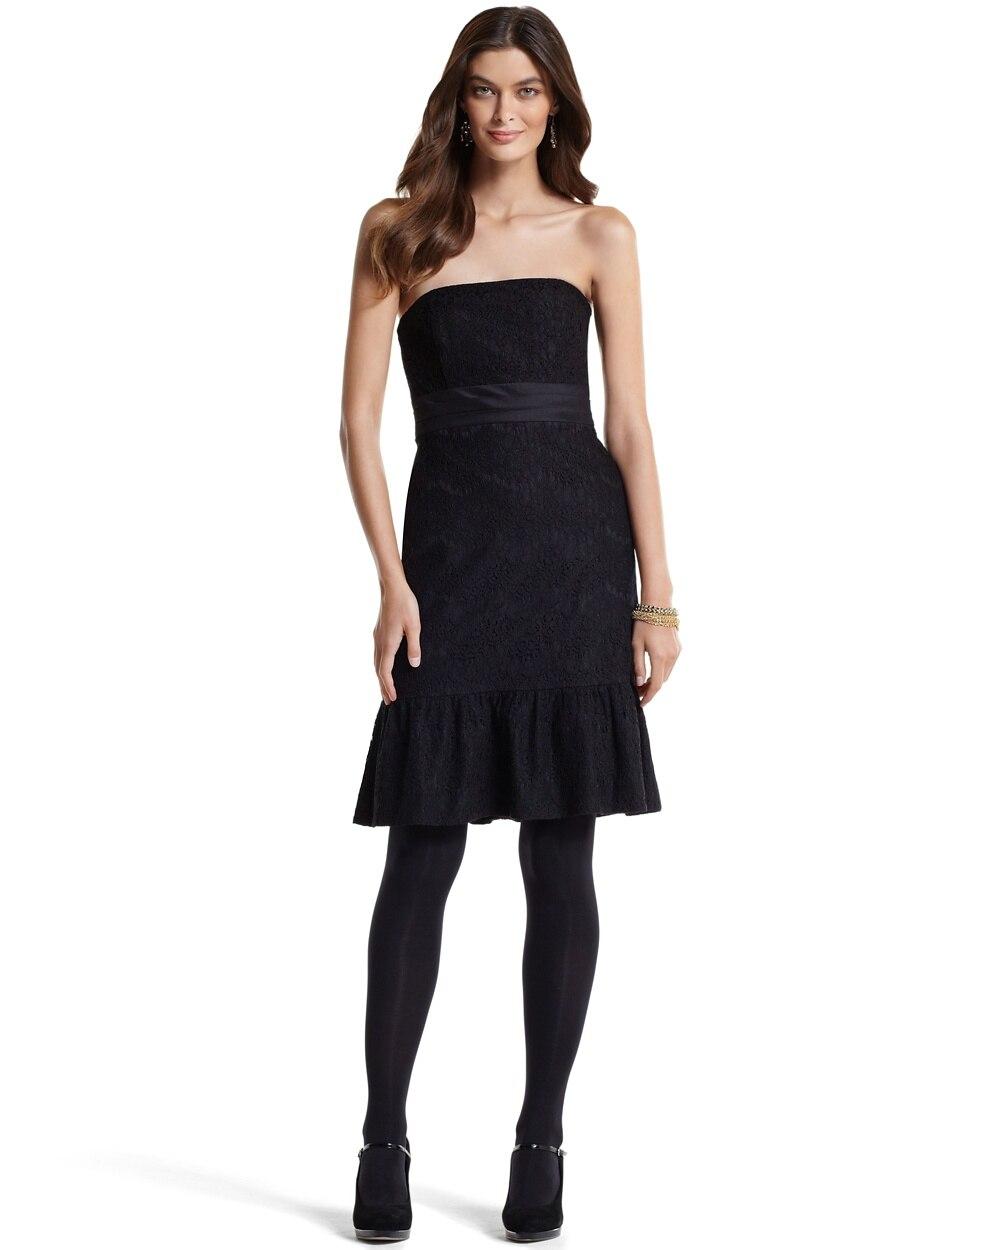 Strapless Lace Flounced Dress White House Black Market